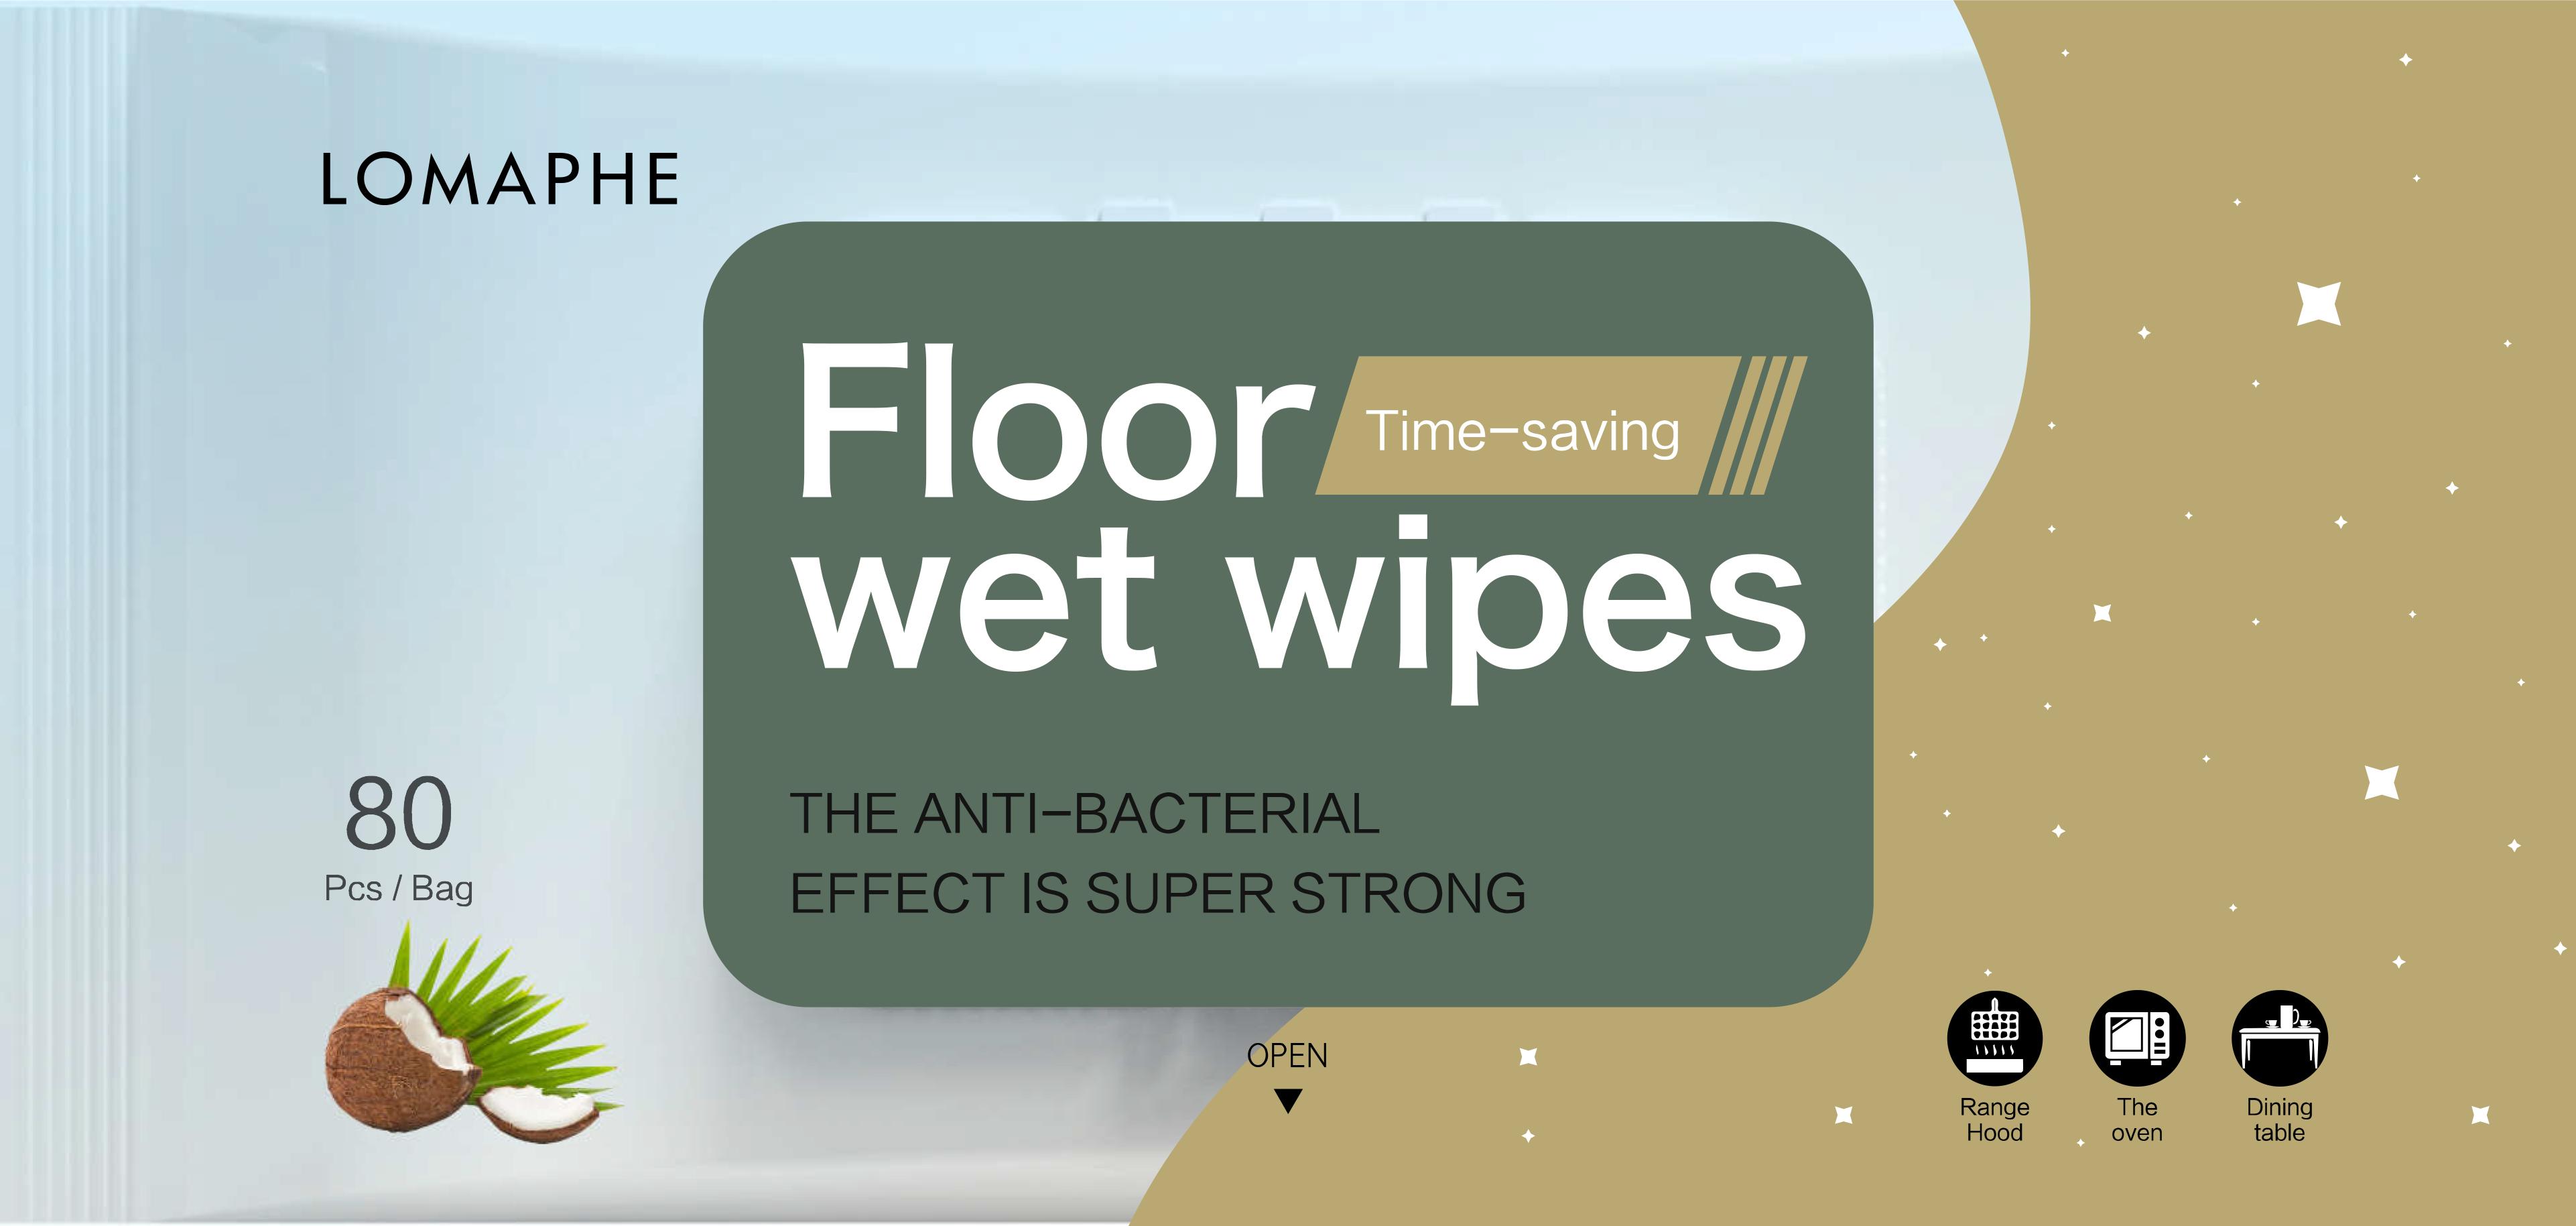 Household wipe Guarantee Period2 Years